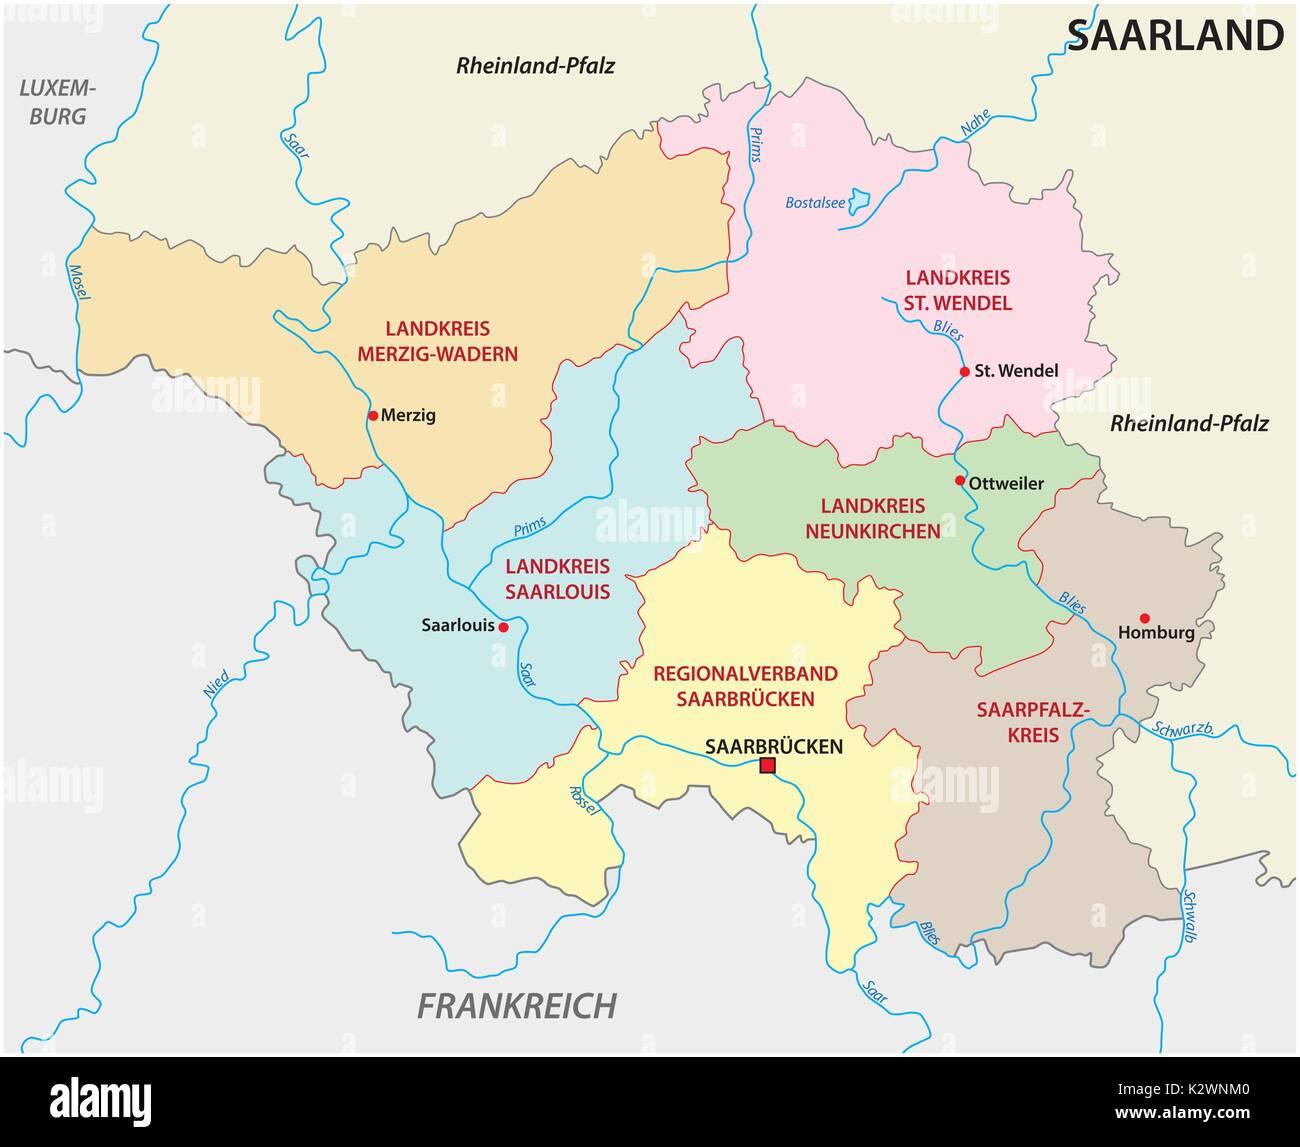 Saarland Germany Europe Map Stock Photos Saarland Germany Europe